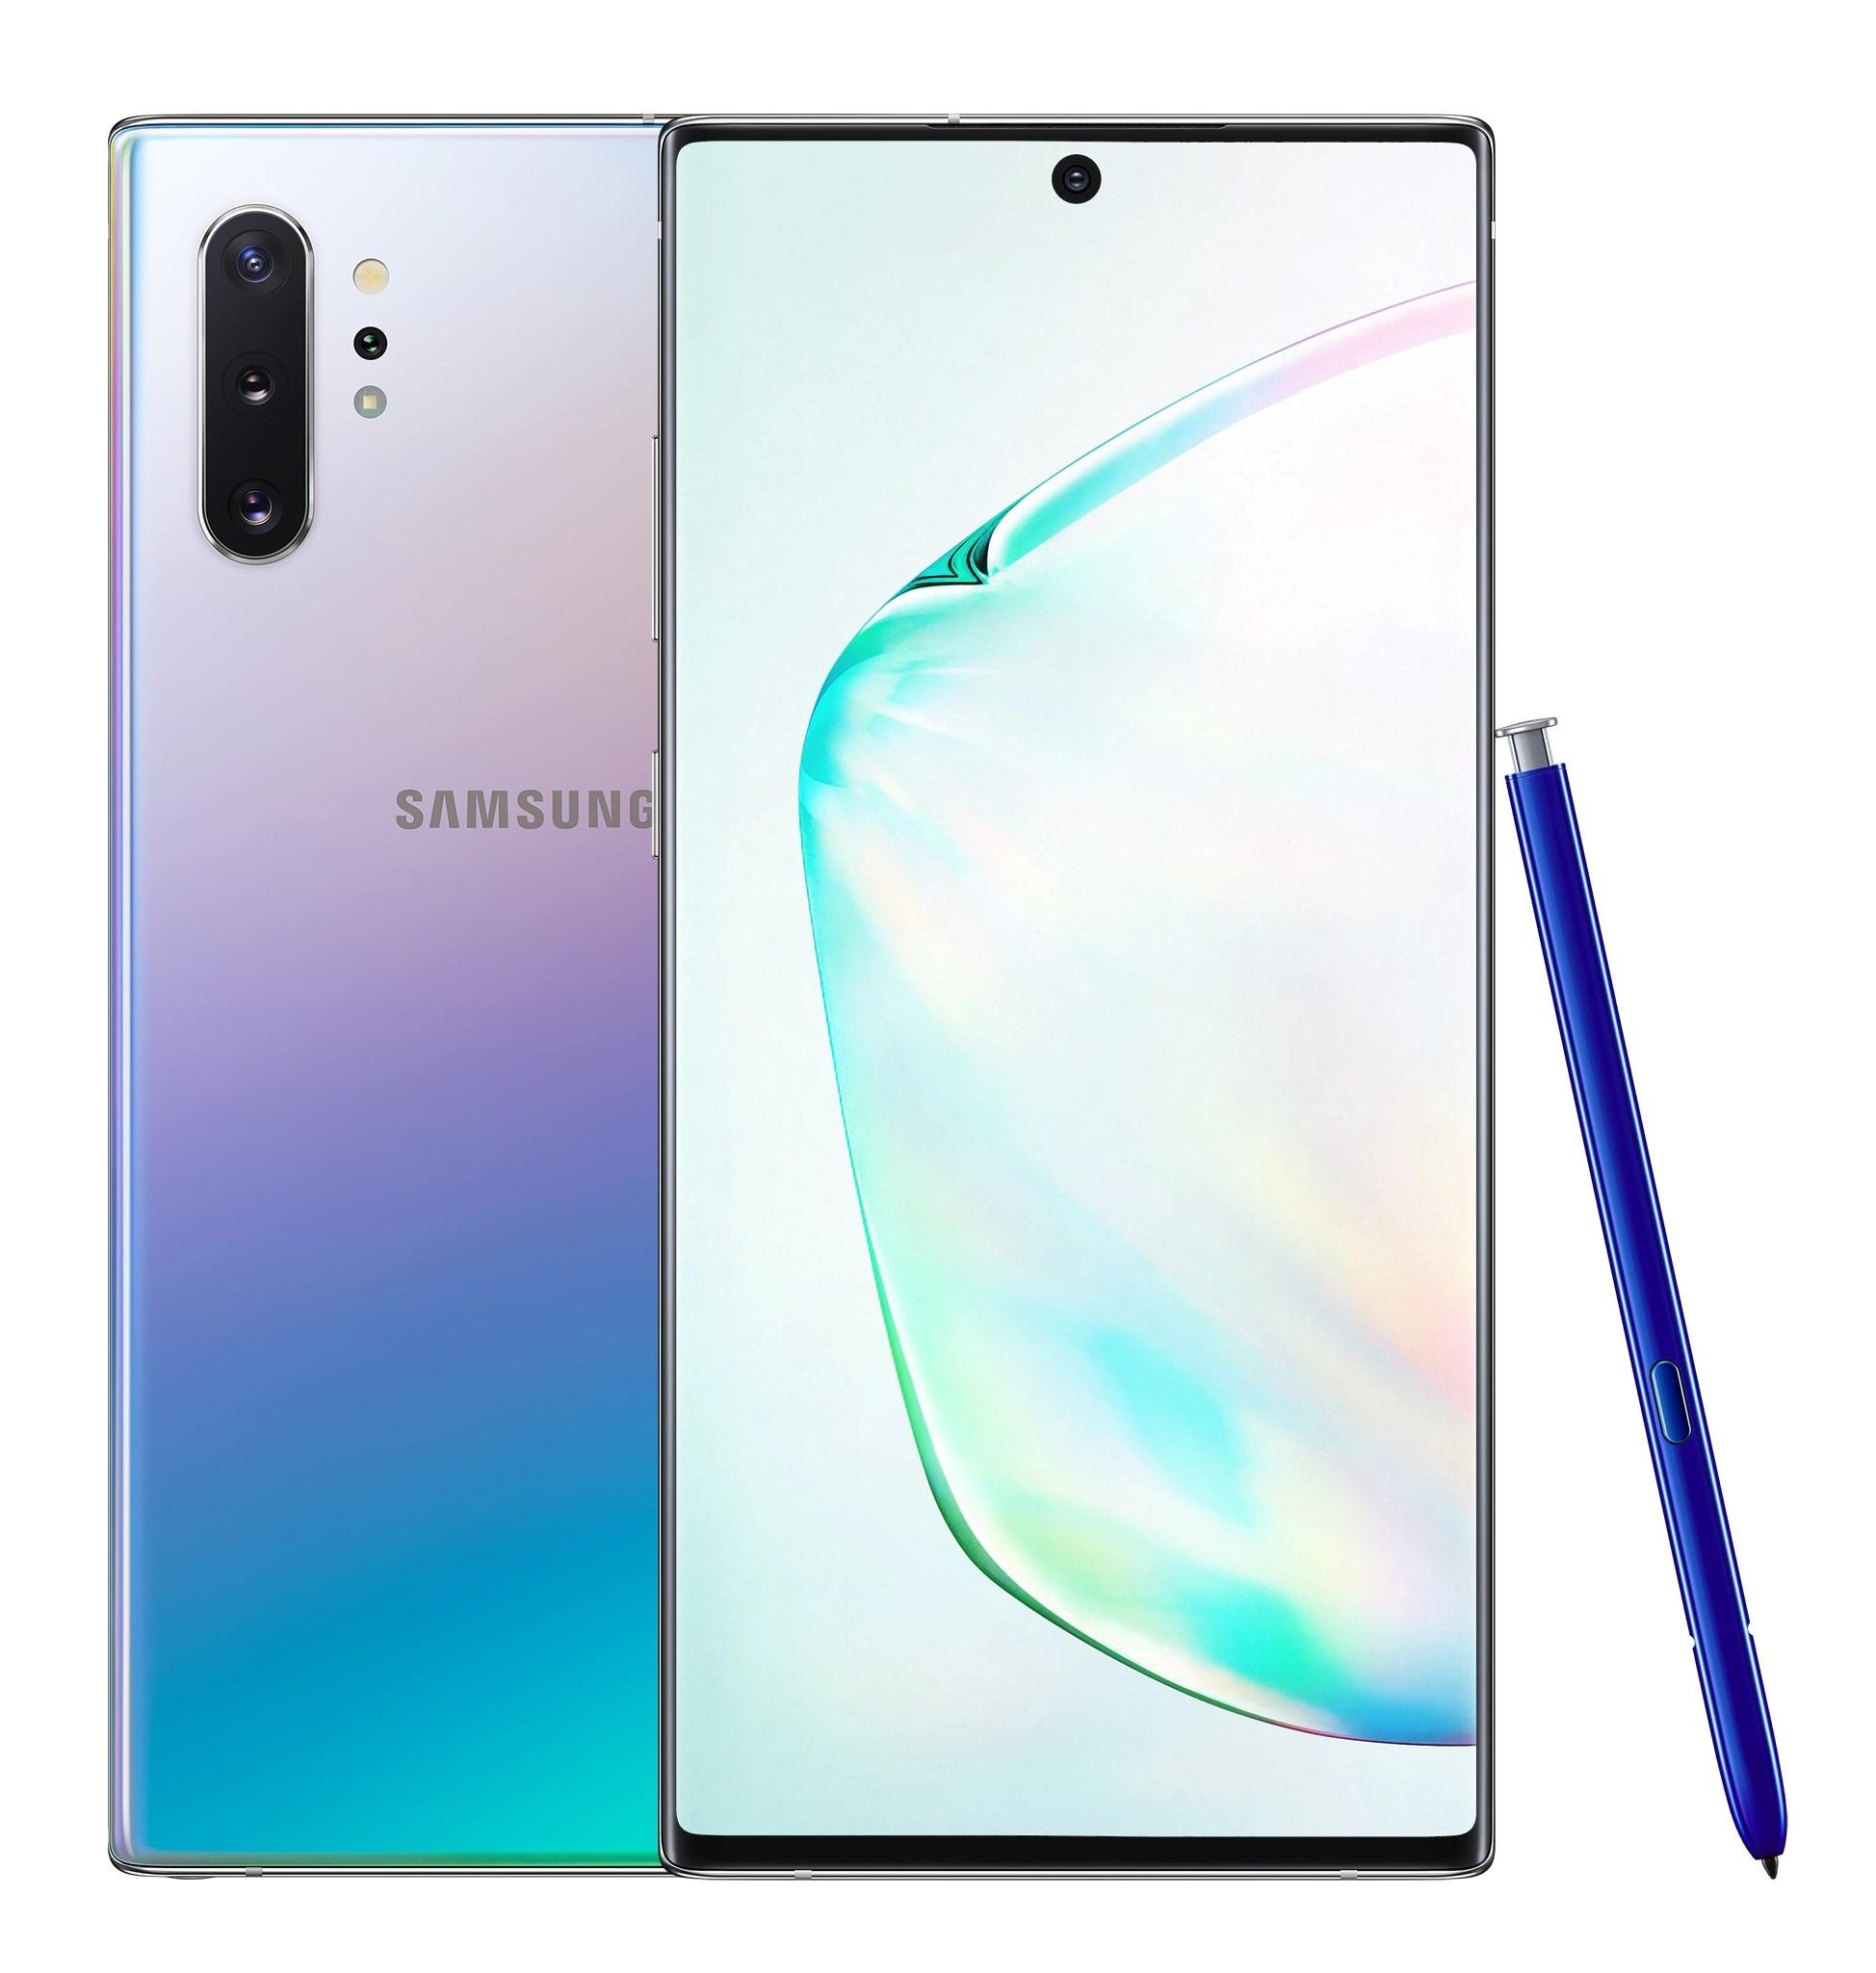 Product Datasheet Samsung Galaxy Note10 Sm N975f 17 3 Cm 6 8 Hybrid Dual Sim Android 9 0 4g Usb Type C 12 Gb 256 Gb 4300 Mah Multicolour Smartphones Sm N975fzsdksa